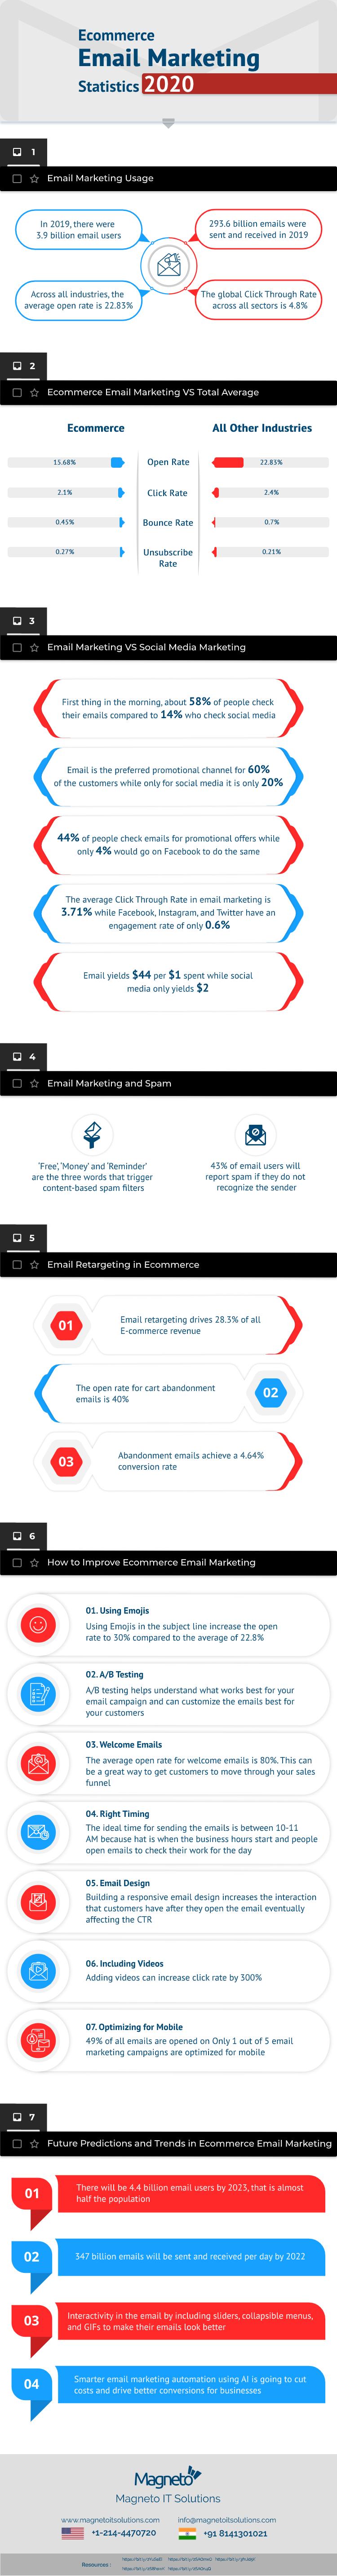 Ecommerce Email Marketing Statistics 2020 - Infographic